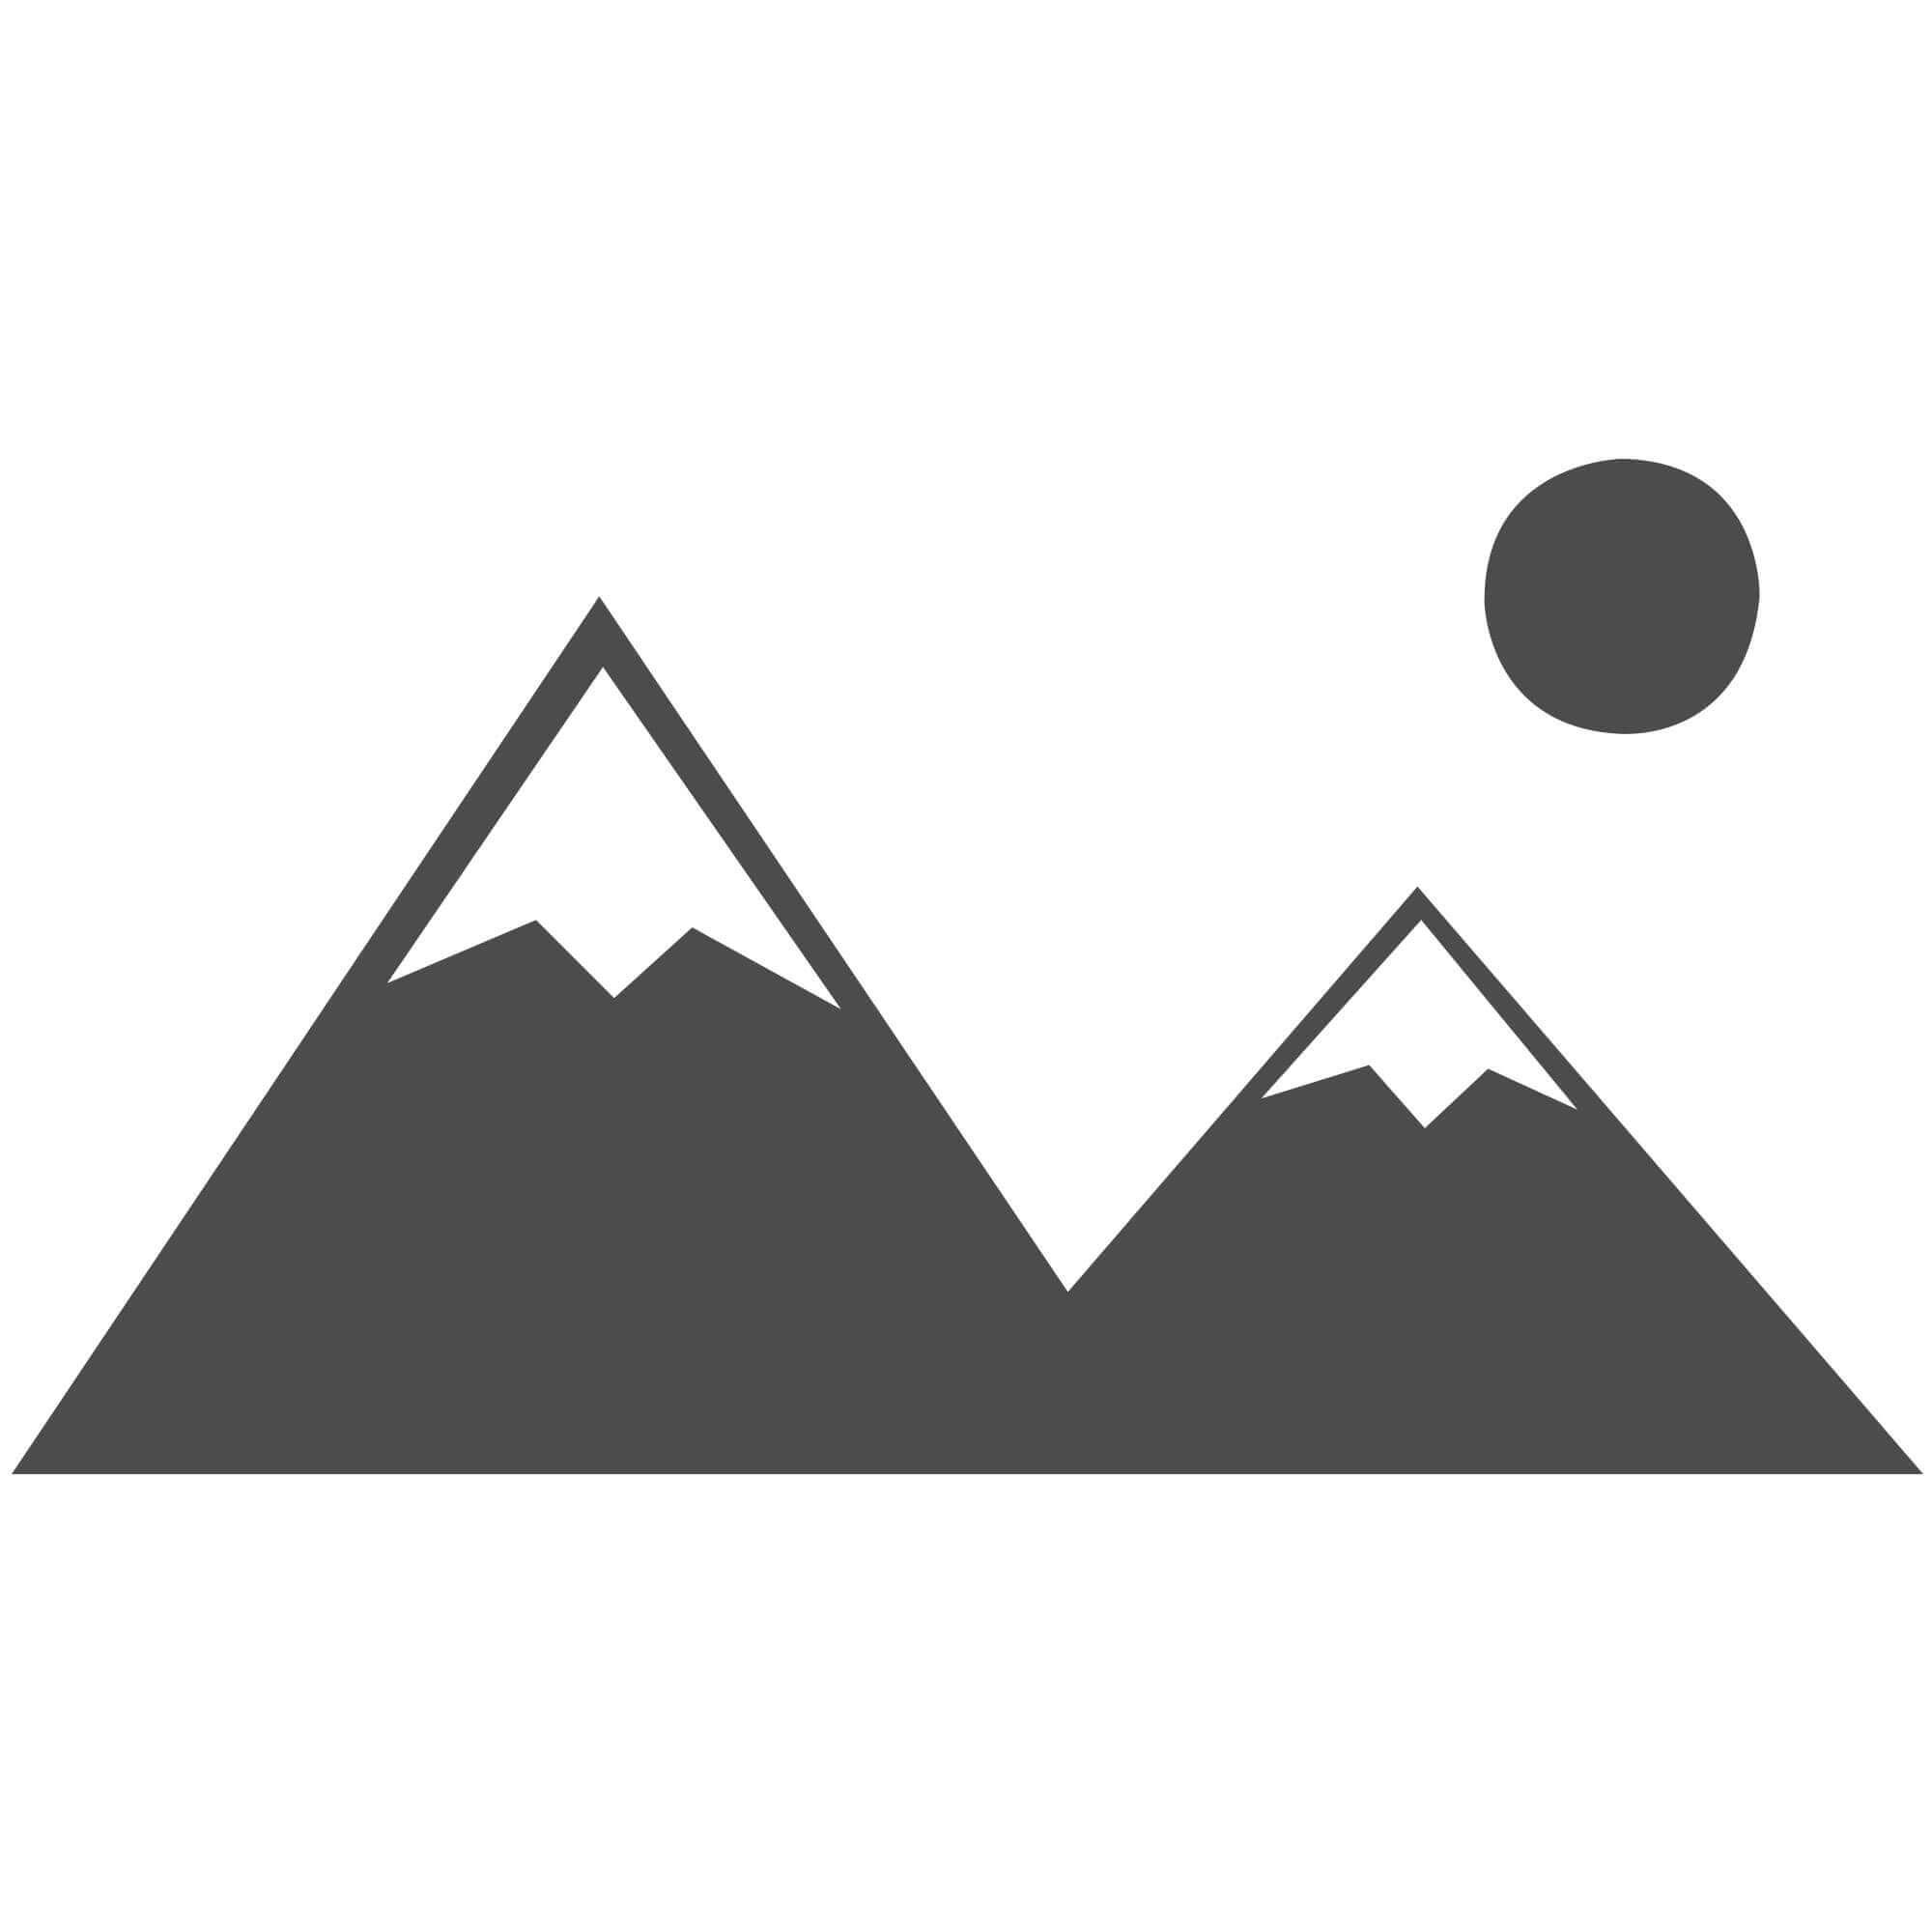 "Alhambra Traditional Rug - 6345c ivory/beige - Size 240 x 330 cm (7'10"" x 10'10"")"